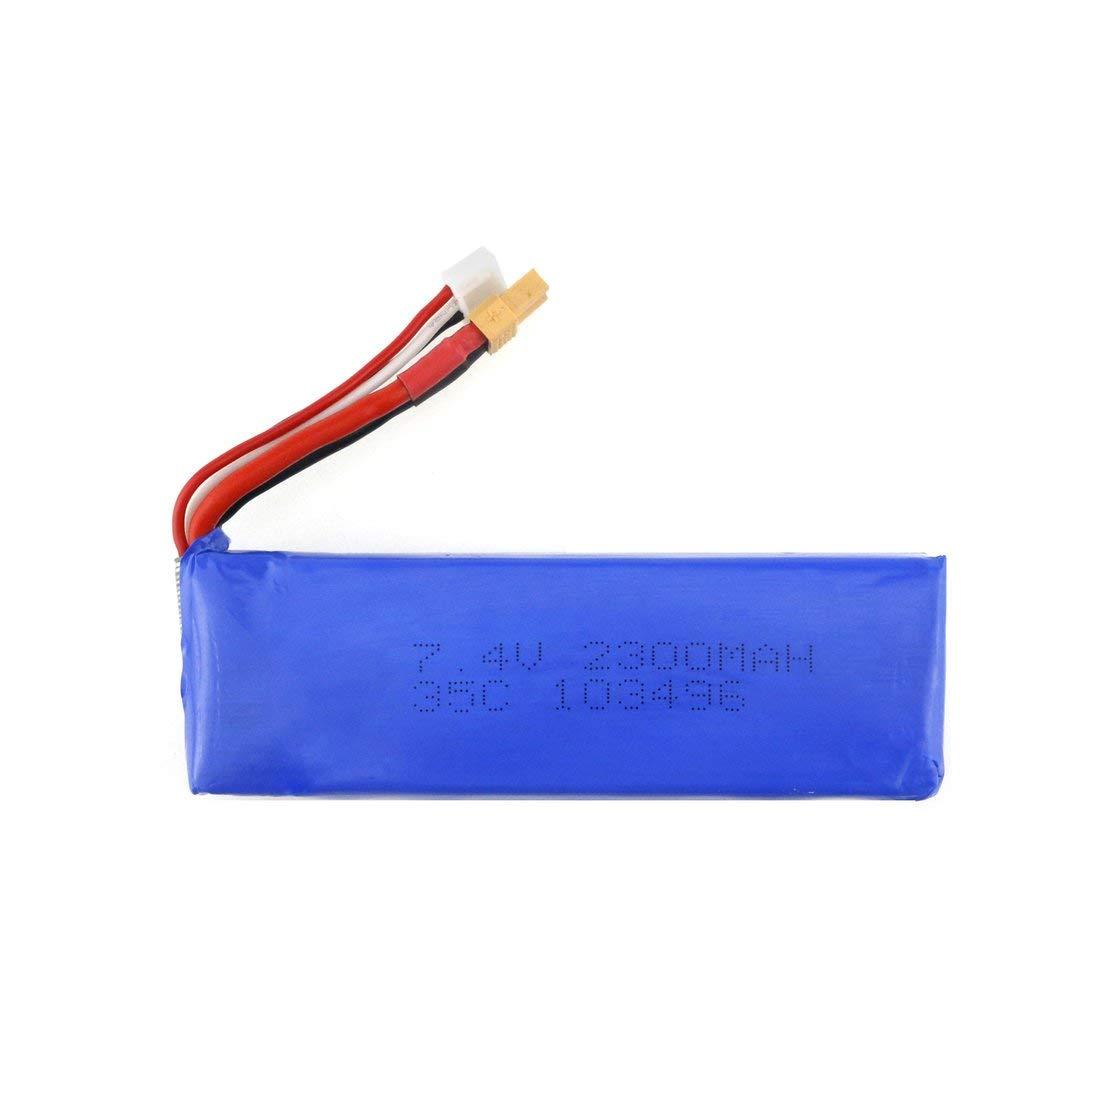 Laurelmartina 3Pcs Actualizado 7.4V 2300mAh 2S 35C Li-po Batería Recargable con XT30 Plug Cargador para MJX Bugs 6 B6 RC Drone Quadcopte